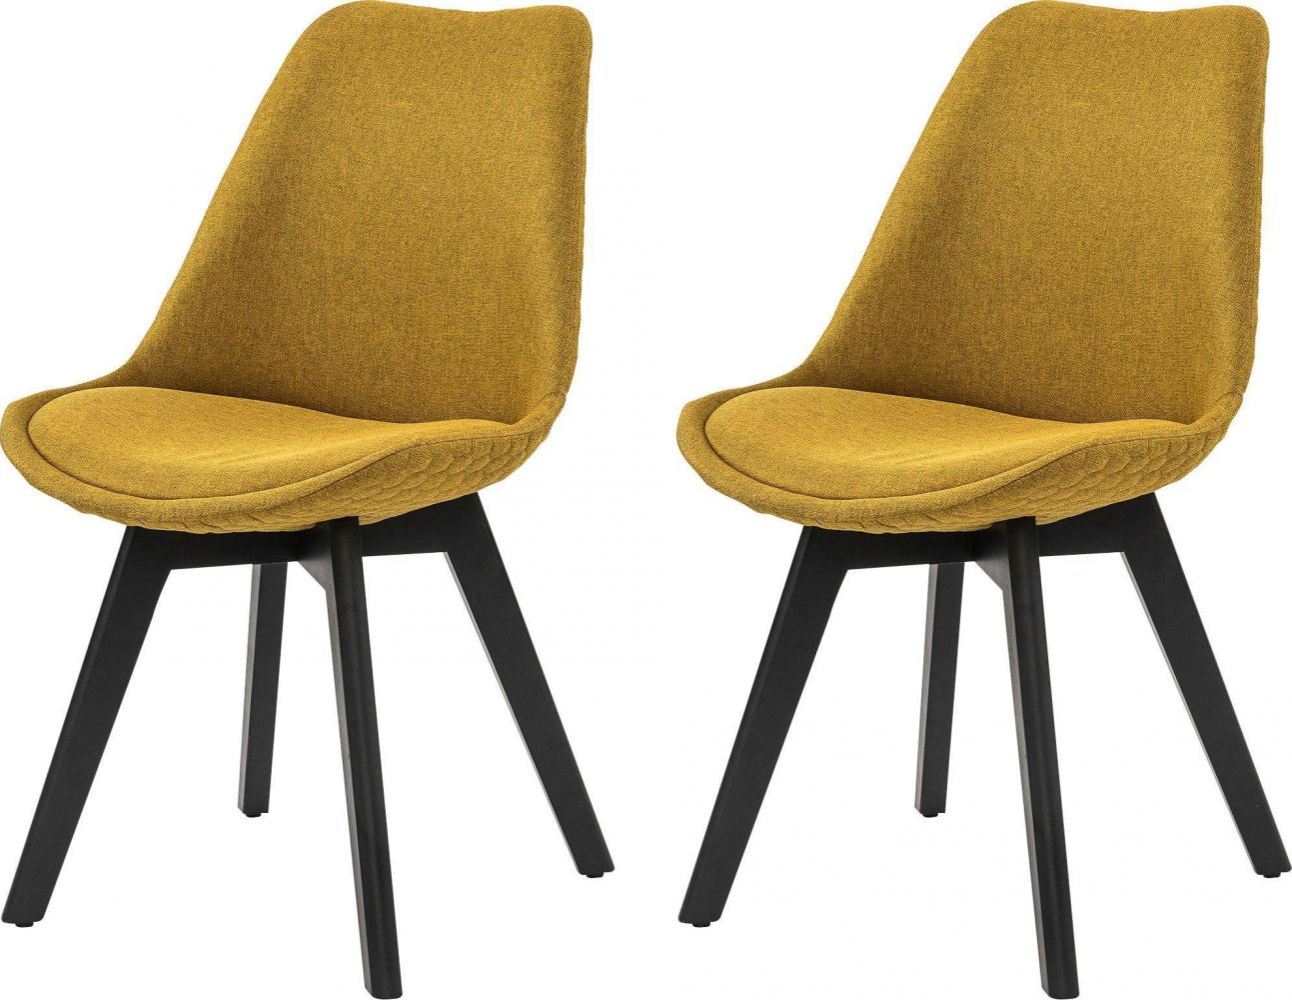 SalesFever 2er-Set Esszimmerstuhl mit Wabensteppung, Textil/Holz, L = 49 x B = 56,5 x H = 84 gelb Bild 1